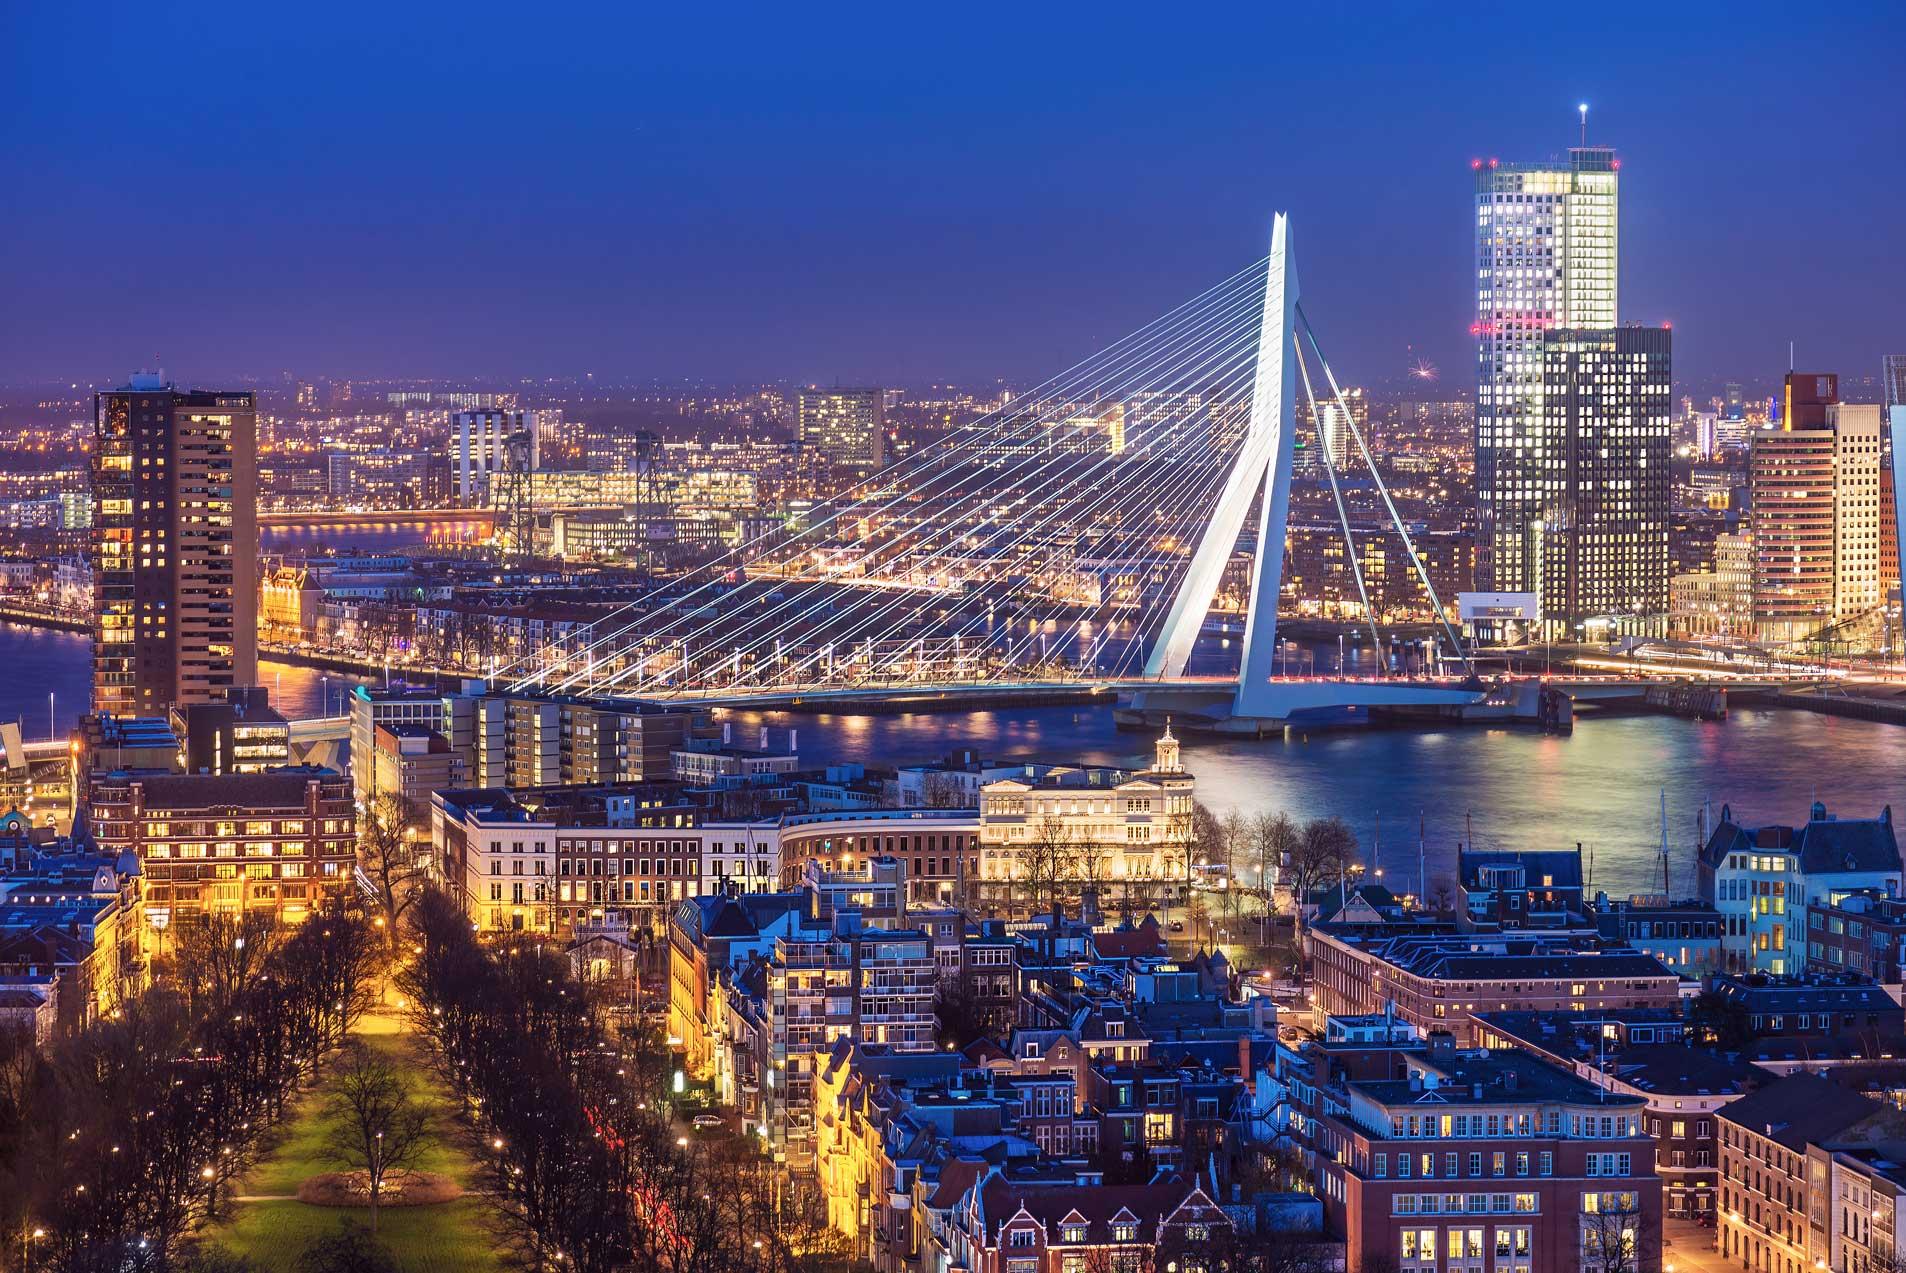 pemandangan jembatan dan kota rotterdam, belanda, dari ketinggian